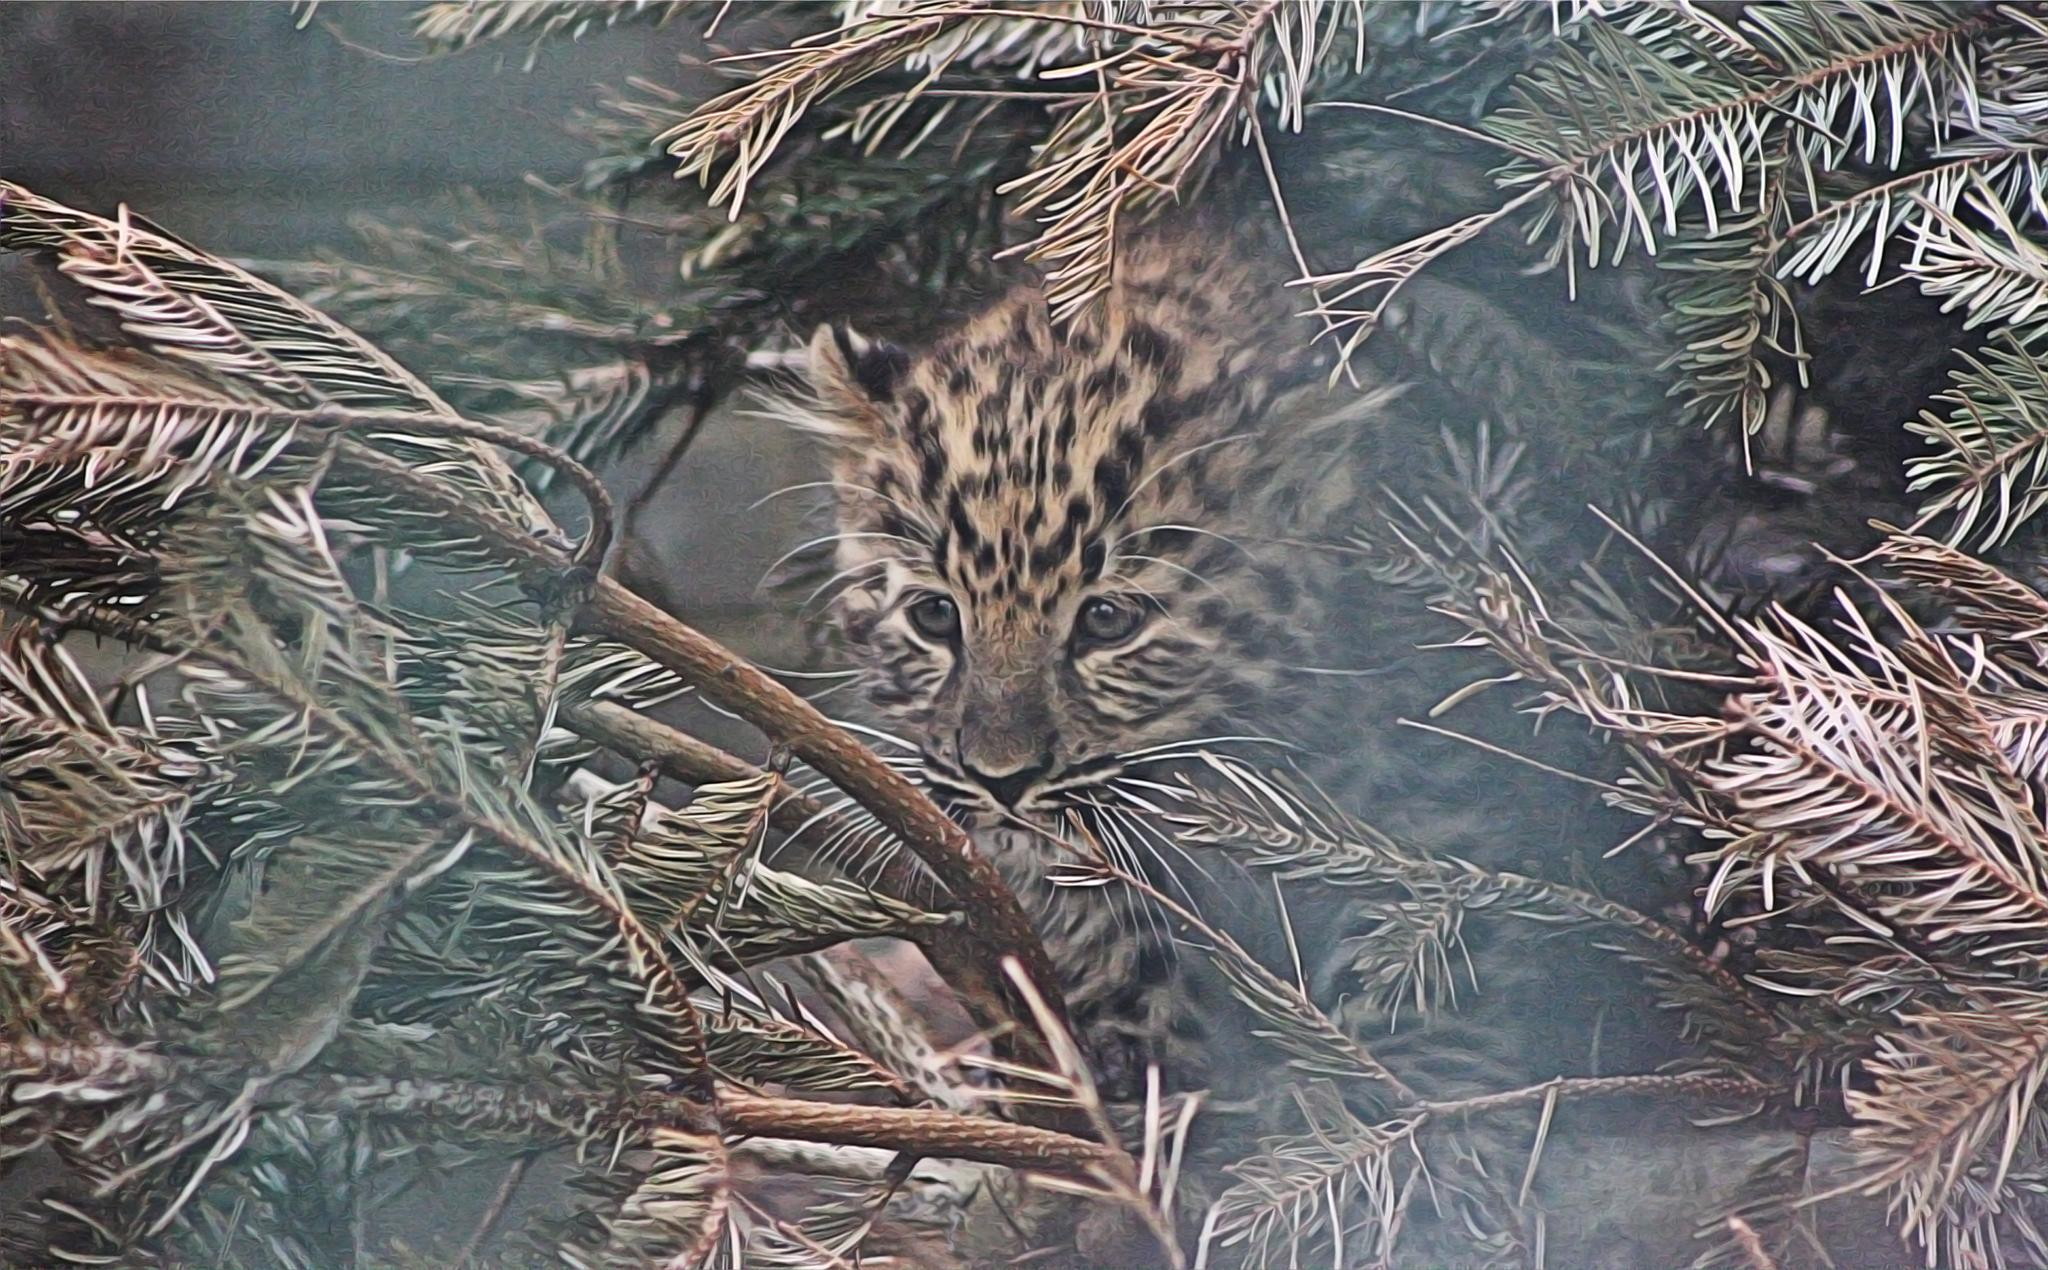 Little Leopard by Henrik T. Sørensen